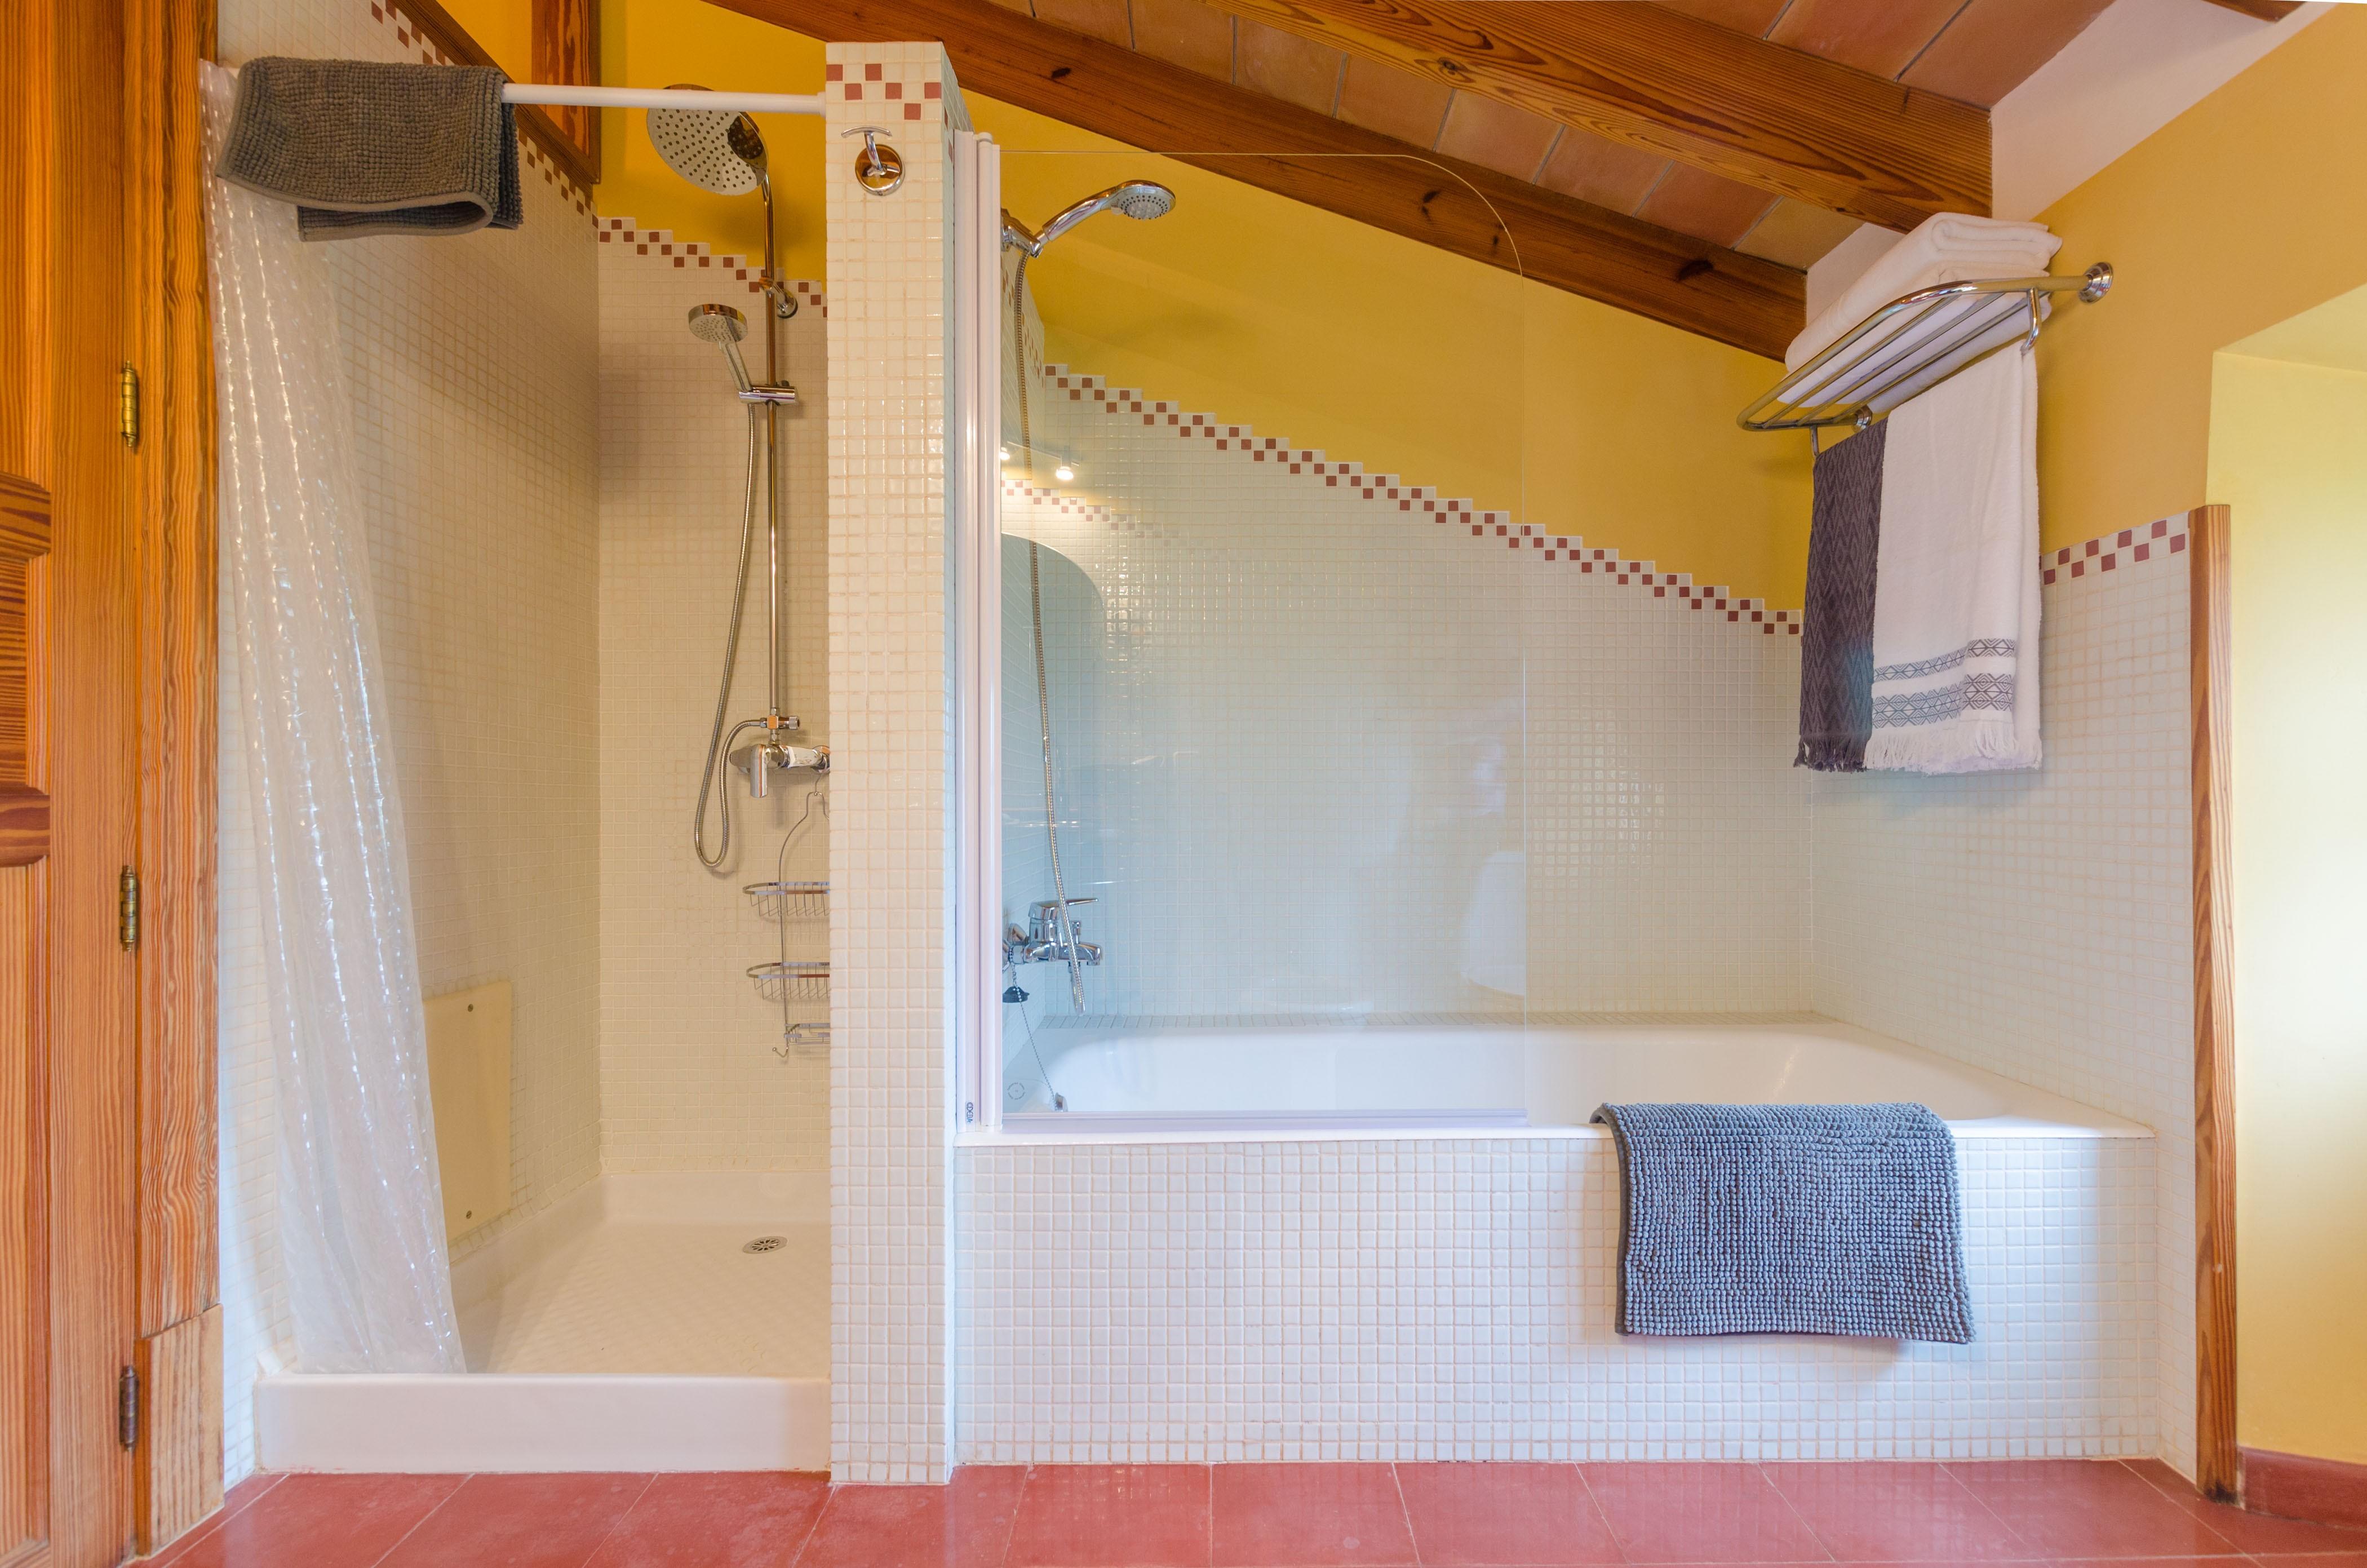 Maison de vacances CAS CONVIDATS (2435013), Alaro, Majorque, Iles Baléares, Espagne, image 56